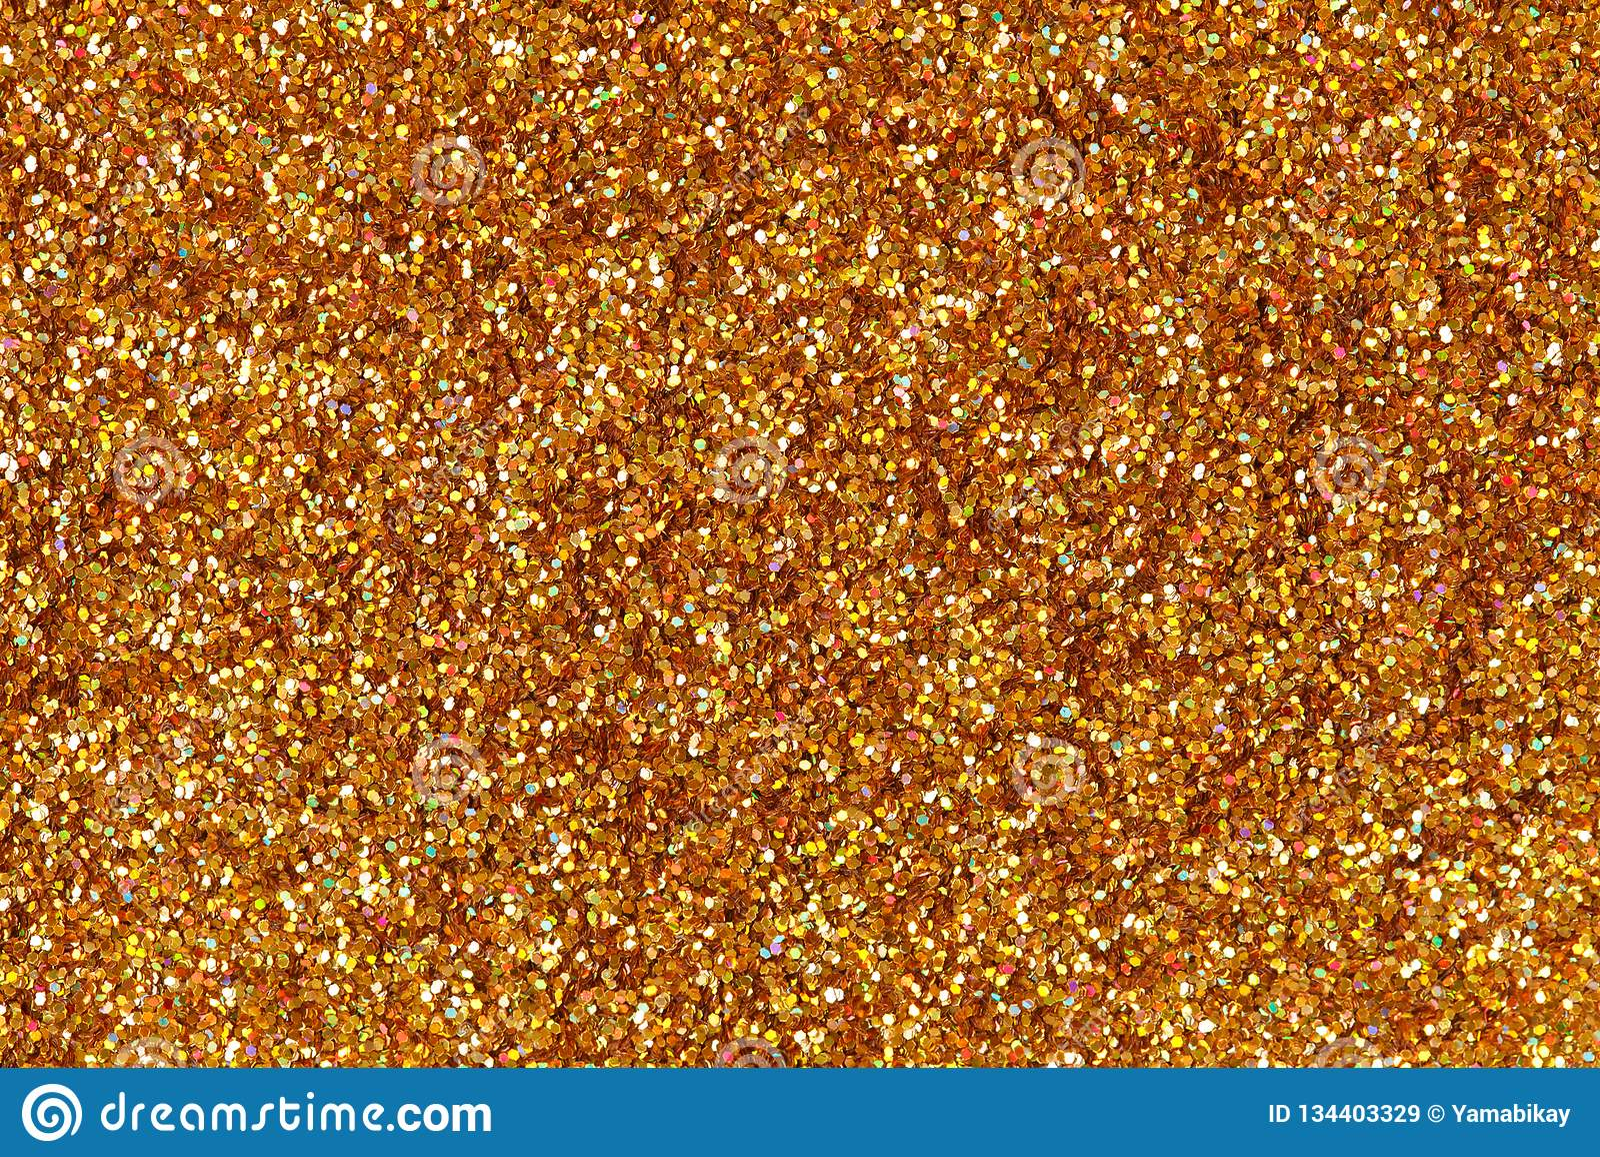 Abstract Orange Gold Glitter Background On Macro Stock